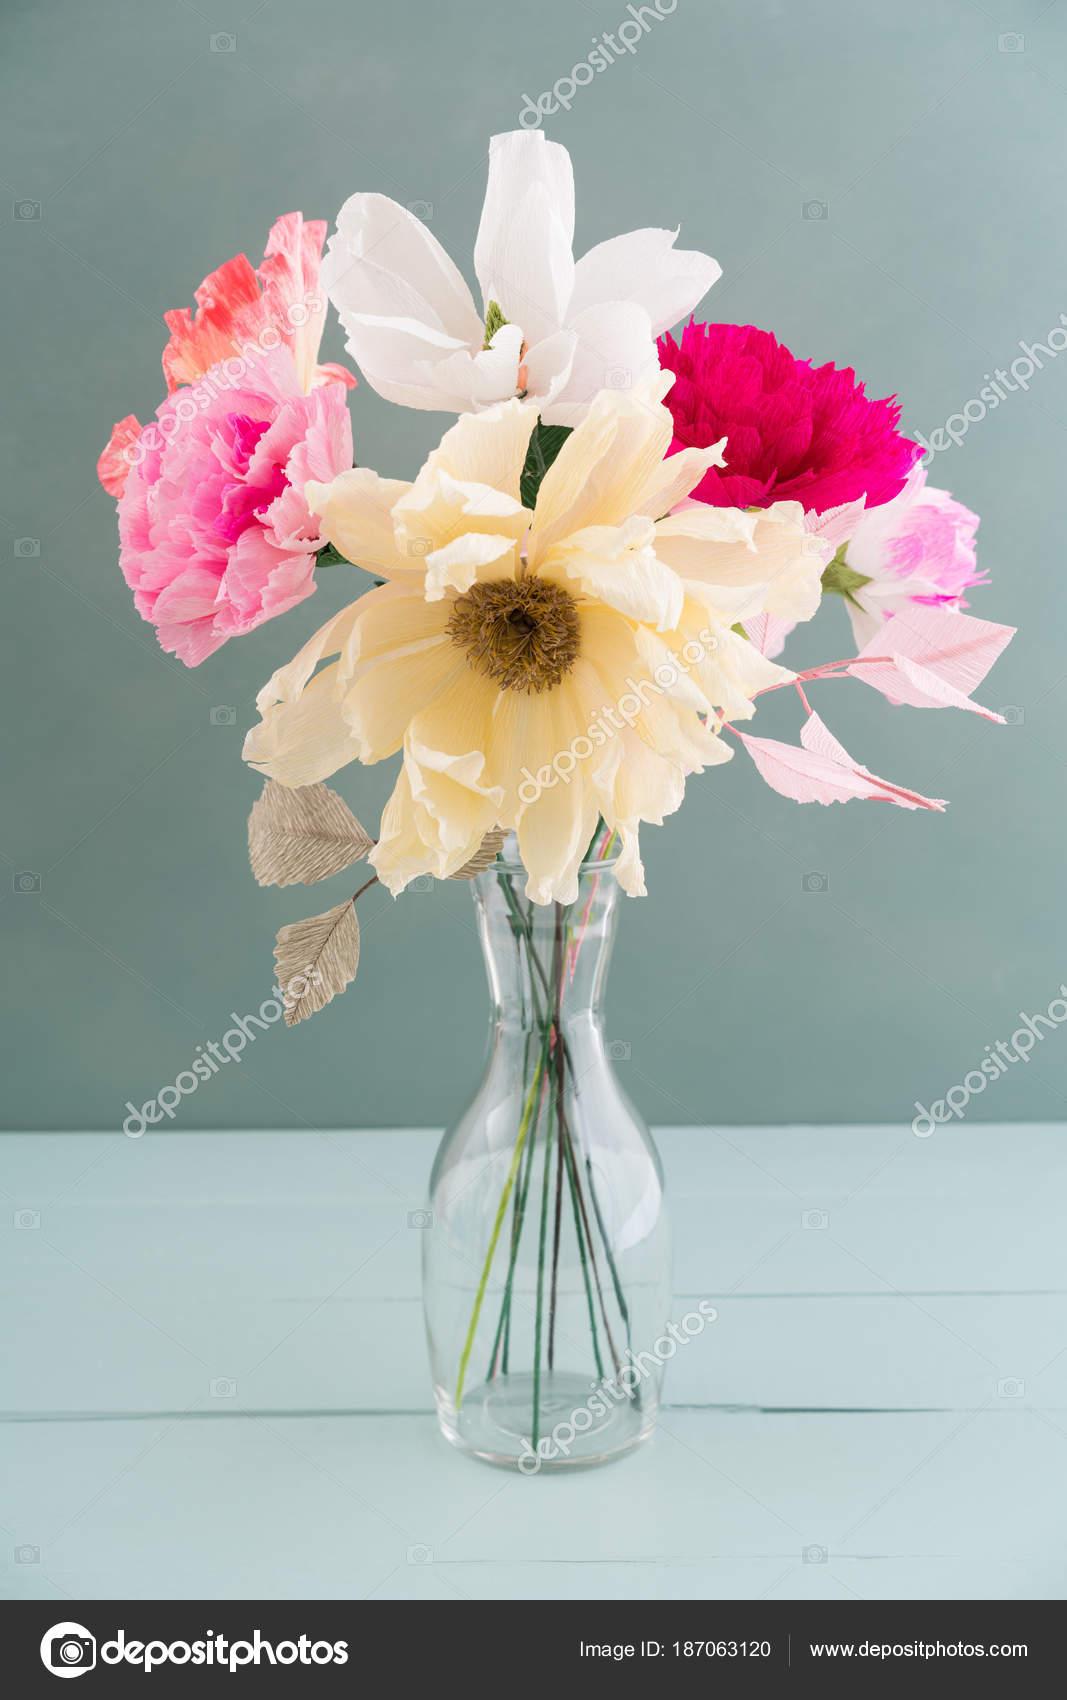 Crepe paper flower bouquet — Stock Photo © ECoelfen #187063120